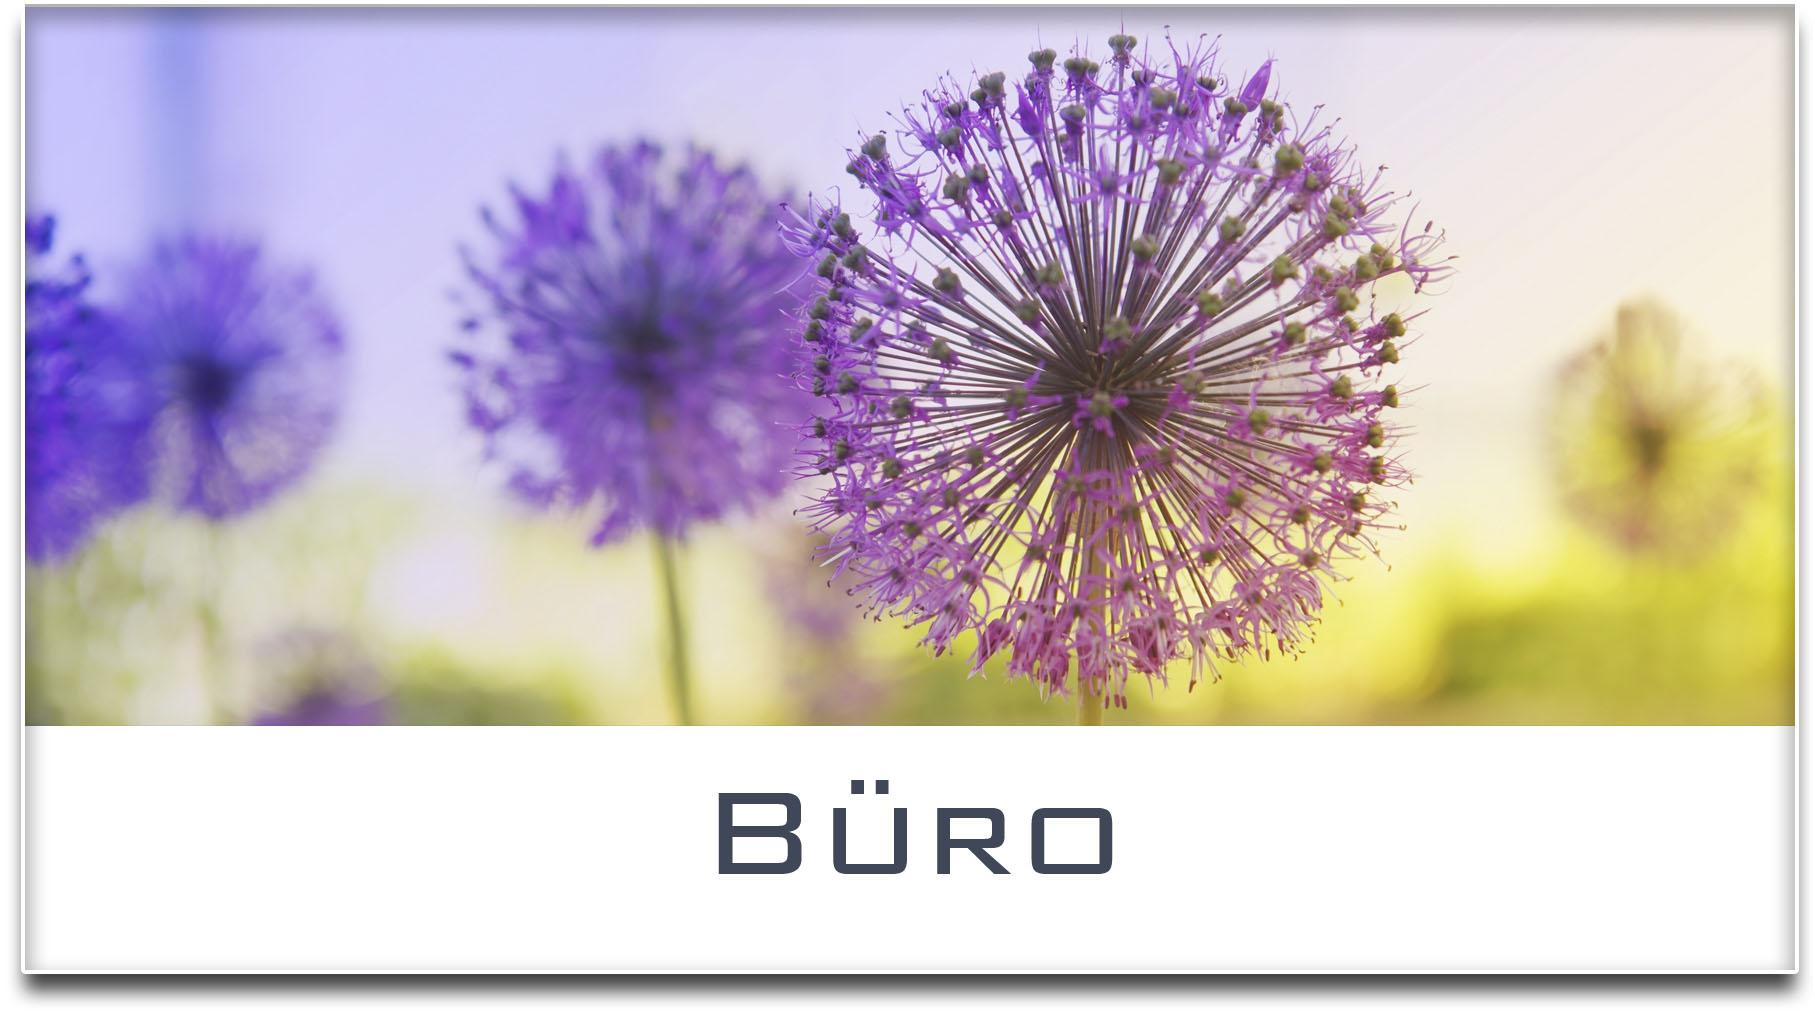 Türschild / Haustürschild / Blume / Büro / Selbstklebend